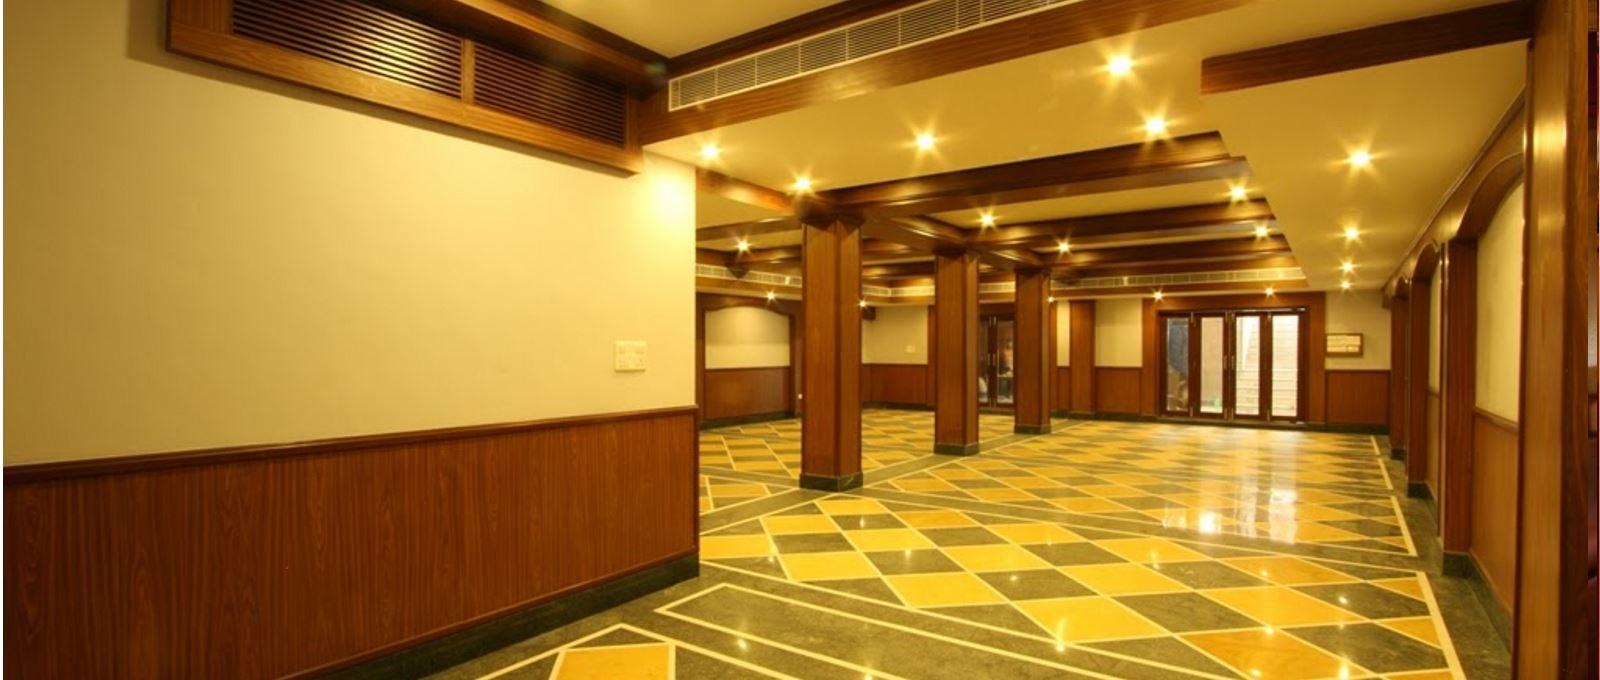 Banqute Hall